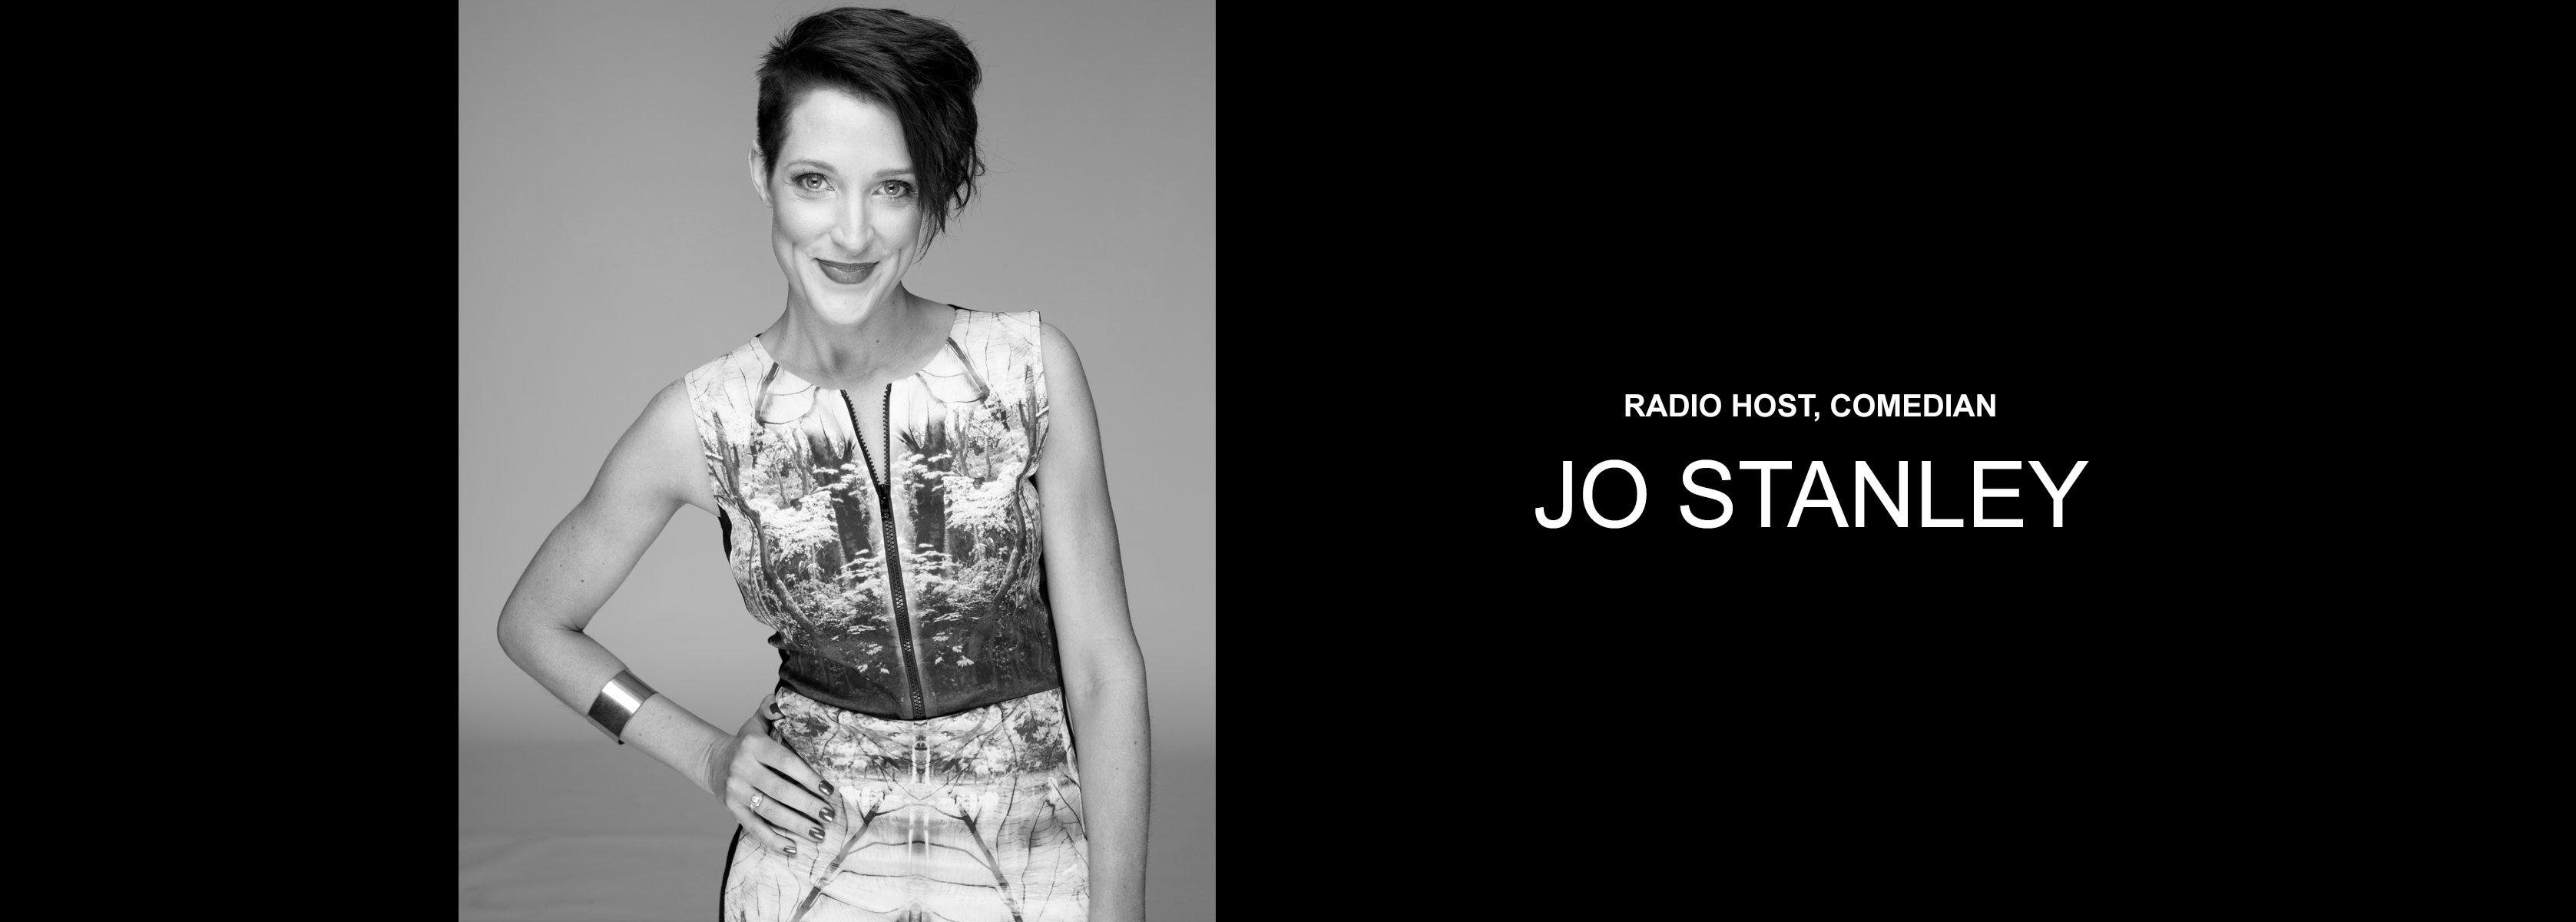 Jo Stanley - Radio Host, Comedian - Bravo Talent Management